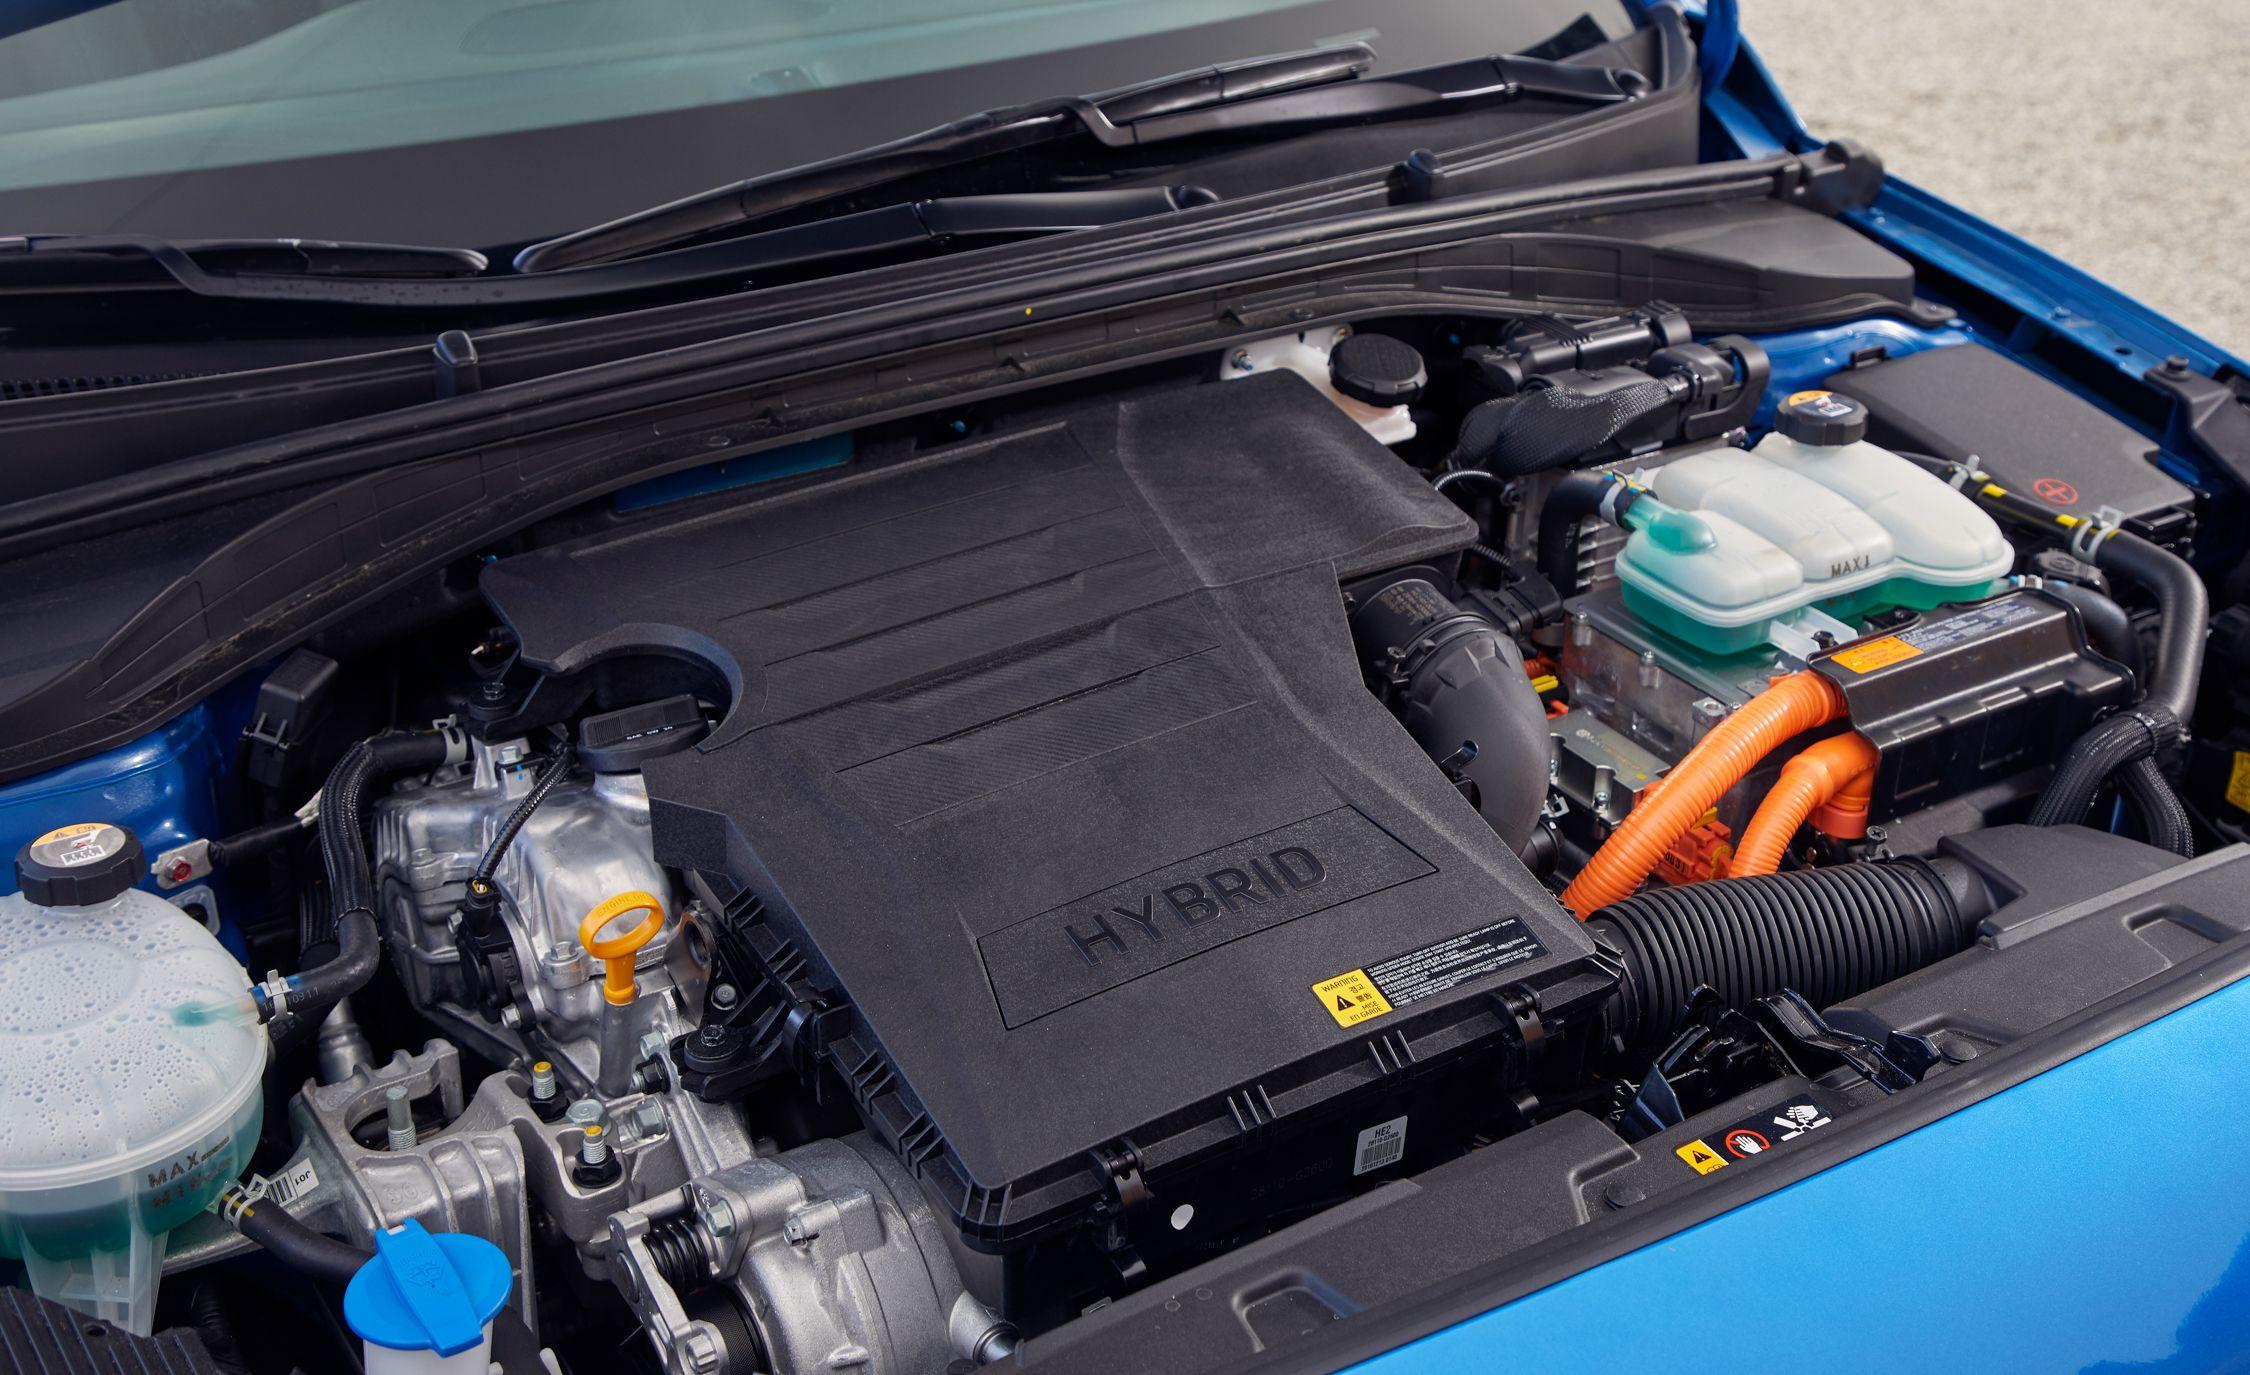 Hyundai Eliminates Traditional Battery In Ioniq Hybrid News Car Automatic Accumulator Filler Circuit Diagram And Driver